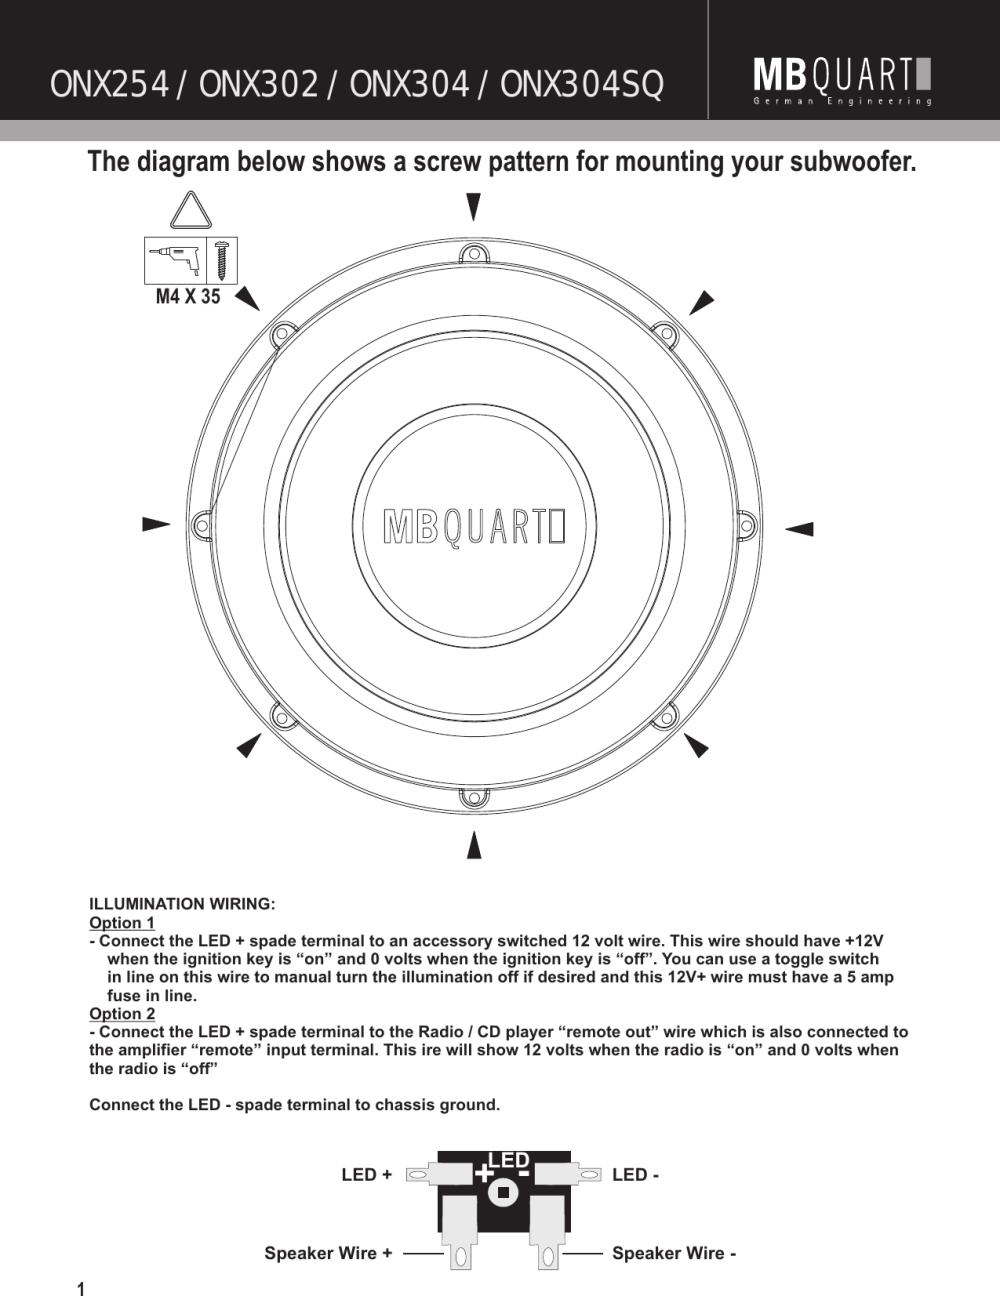 medium resolution of page 2 of 10 mb quart mb quart onx254 users